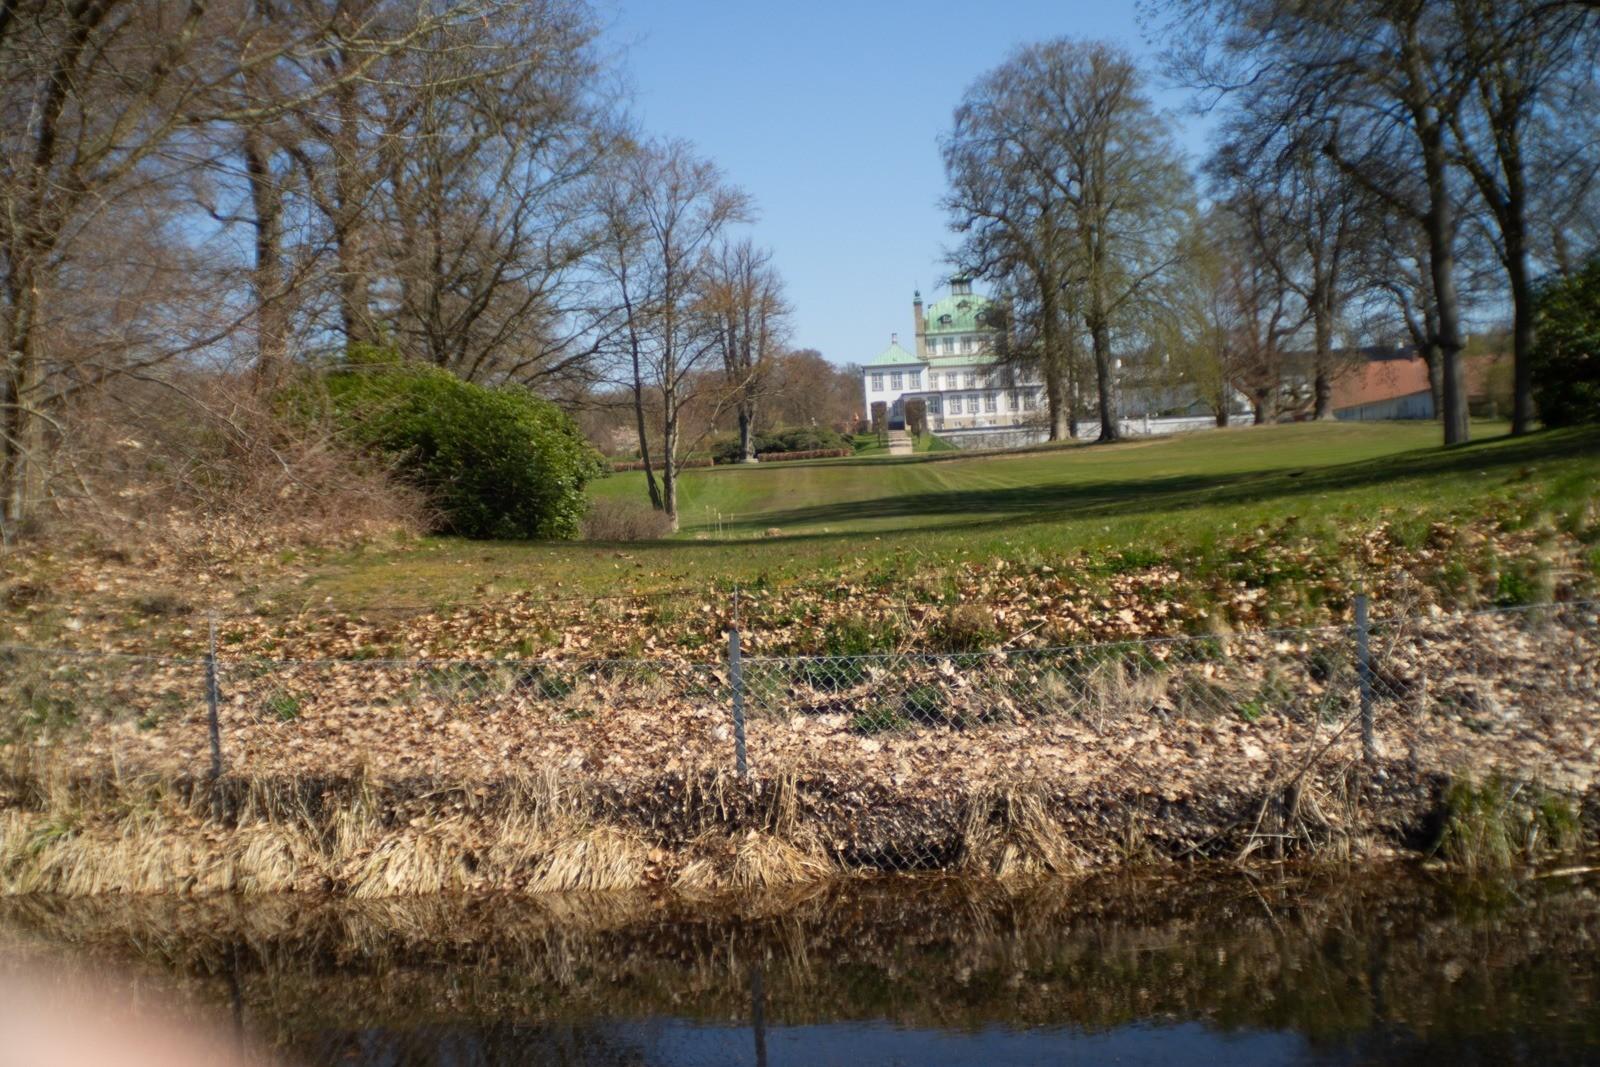 Fotografi eller Lomografi? Lomo-style fotografering i Fredensborg